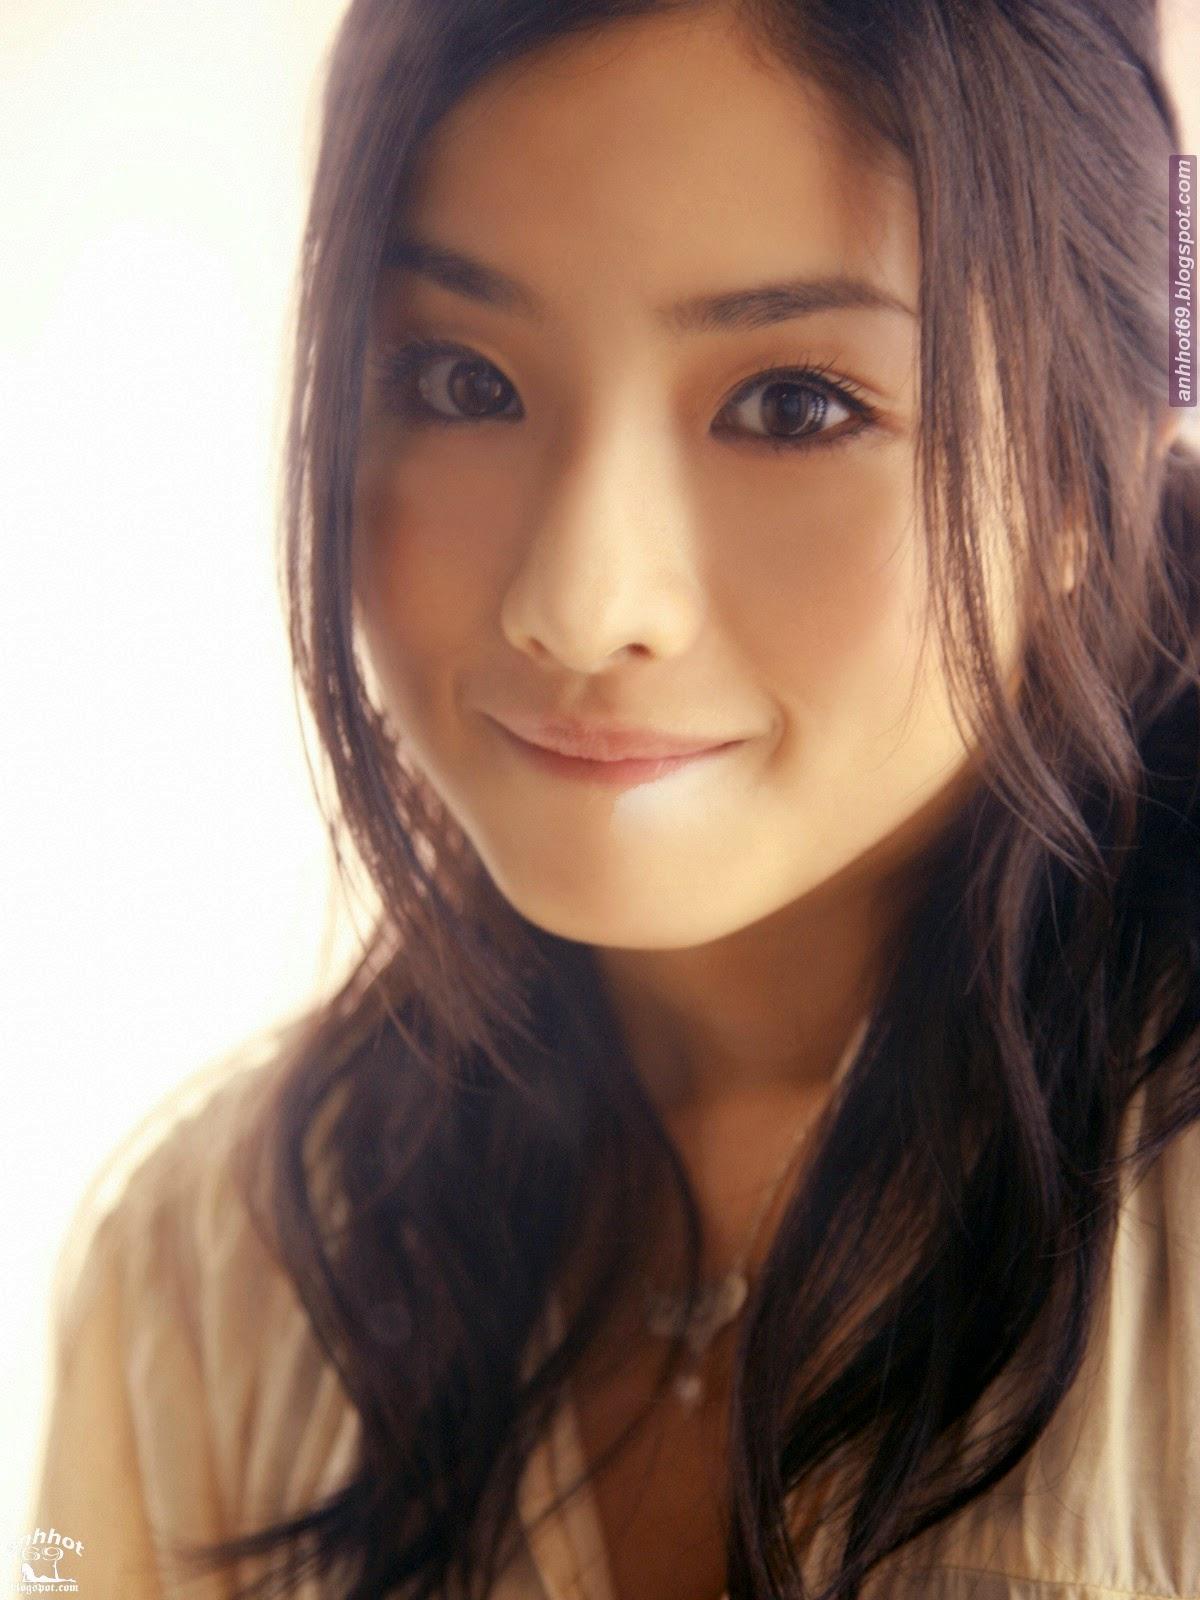 satomi-ishihara-00503956